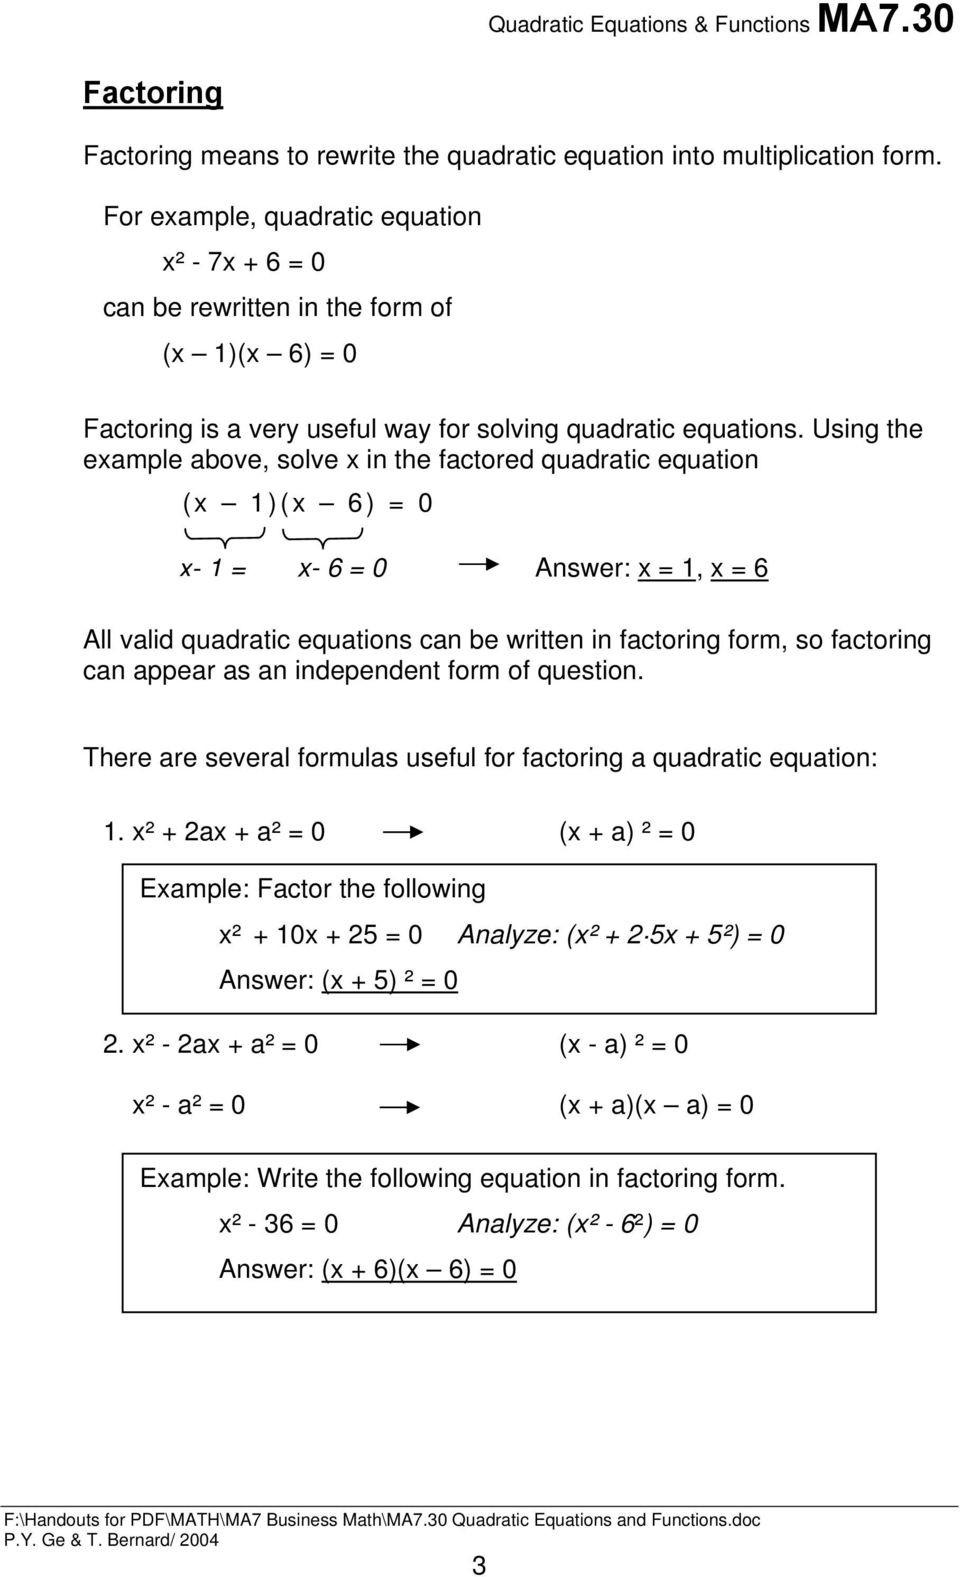 Factoring Quadratic Expressions Worksheet Quadratic Equations and Functions Pdf Free Download